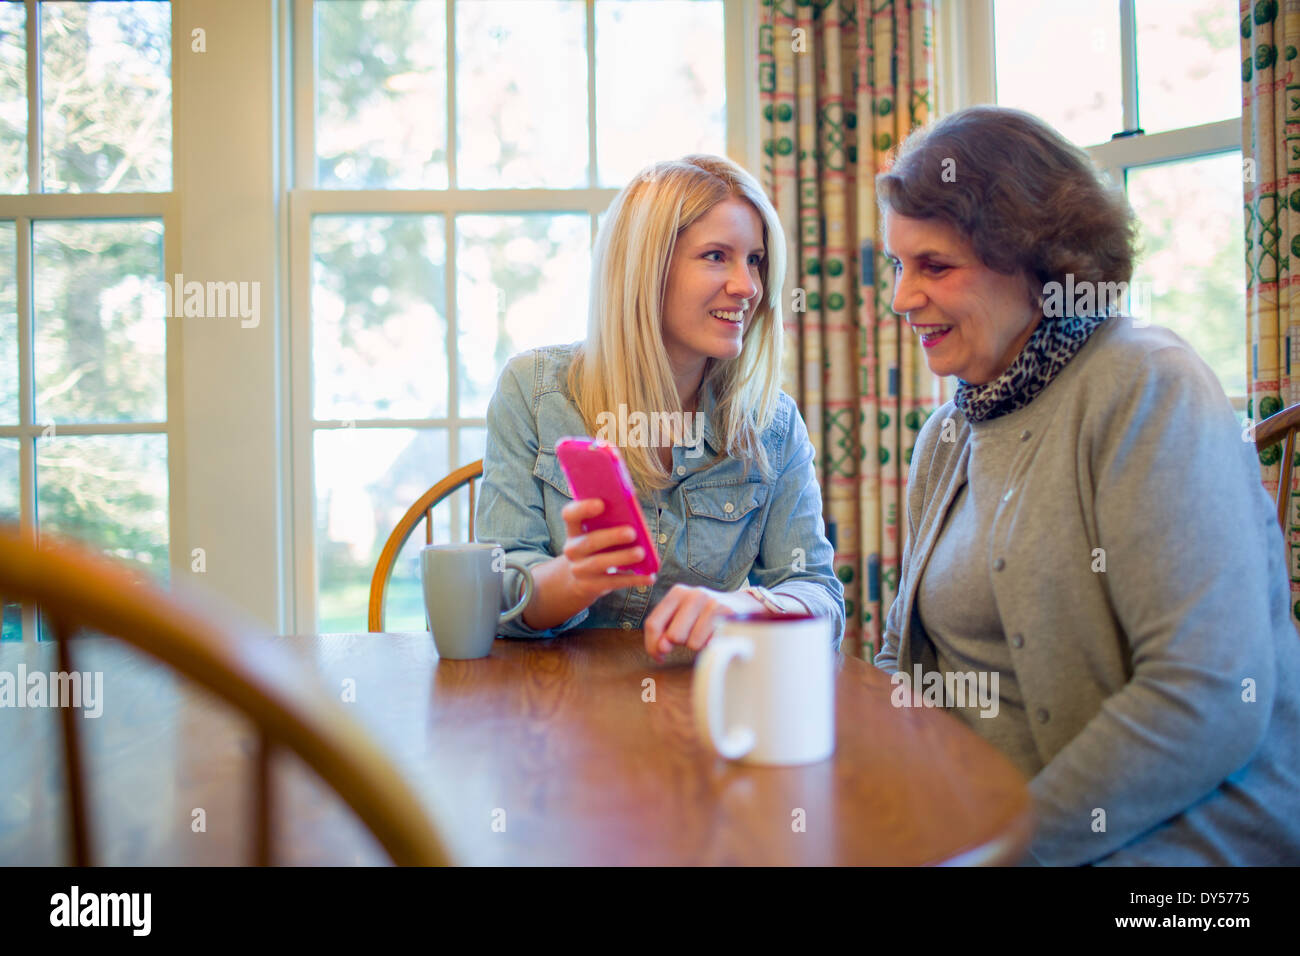 Senior woman and granddaughter looking at smartphone - Stock Image